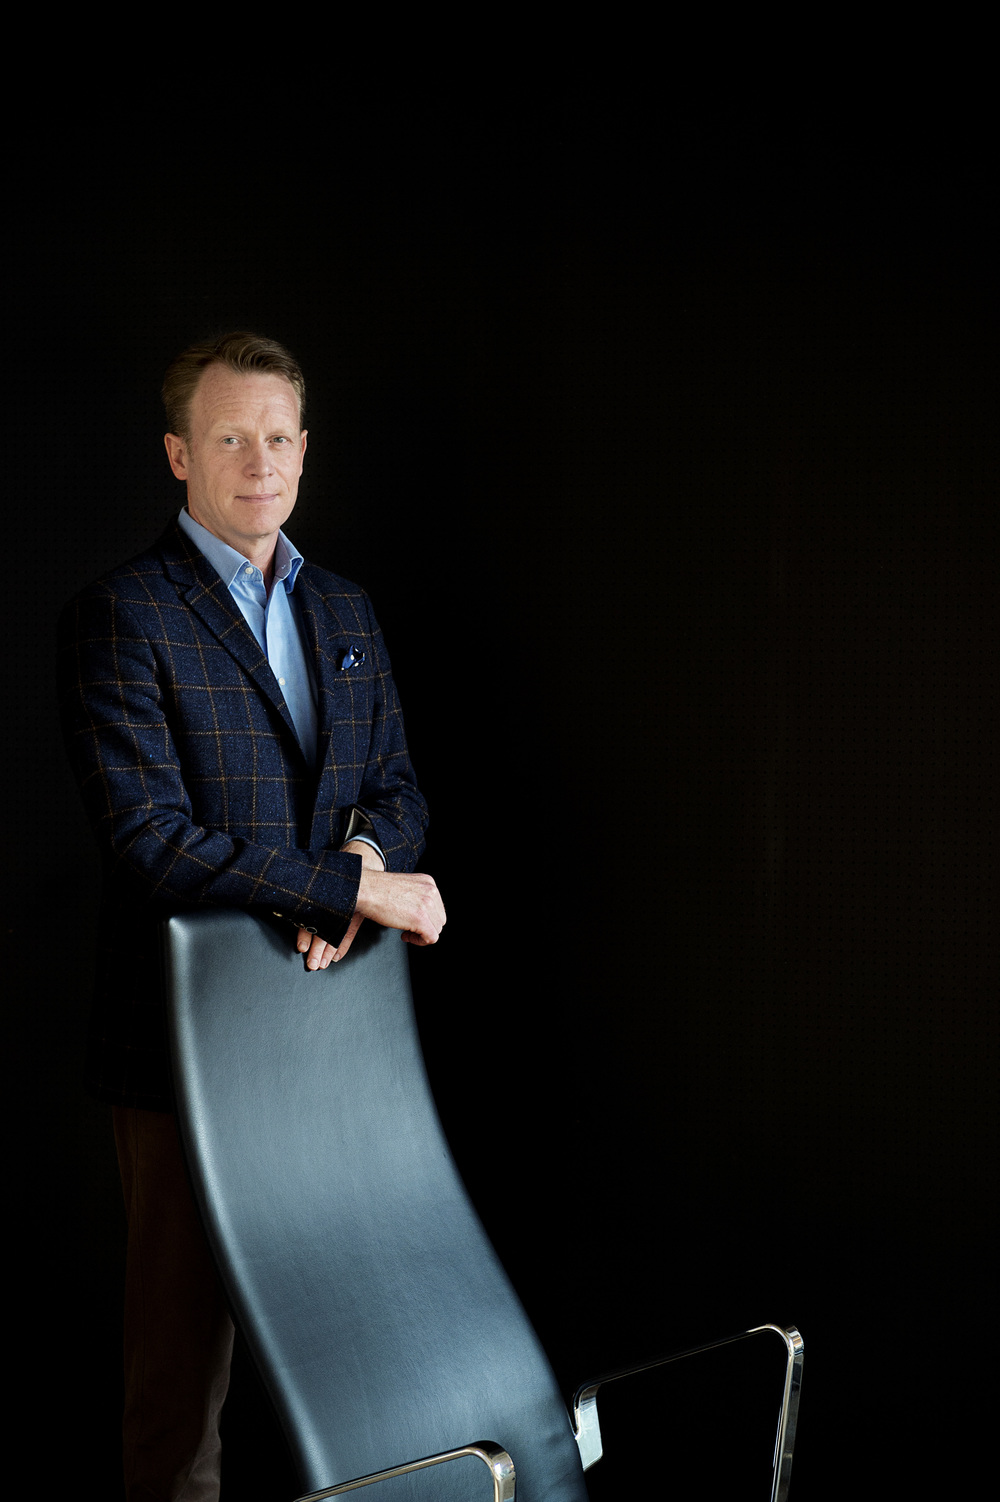 Direktør Christian Engsted, Louis Poulsen